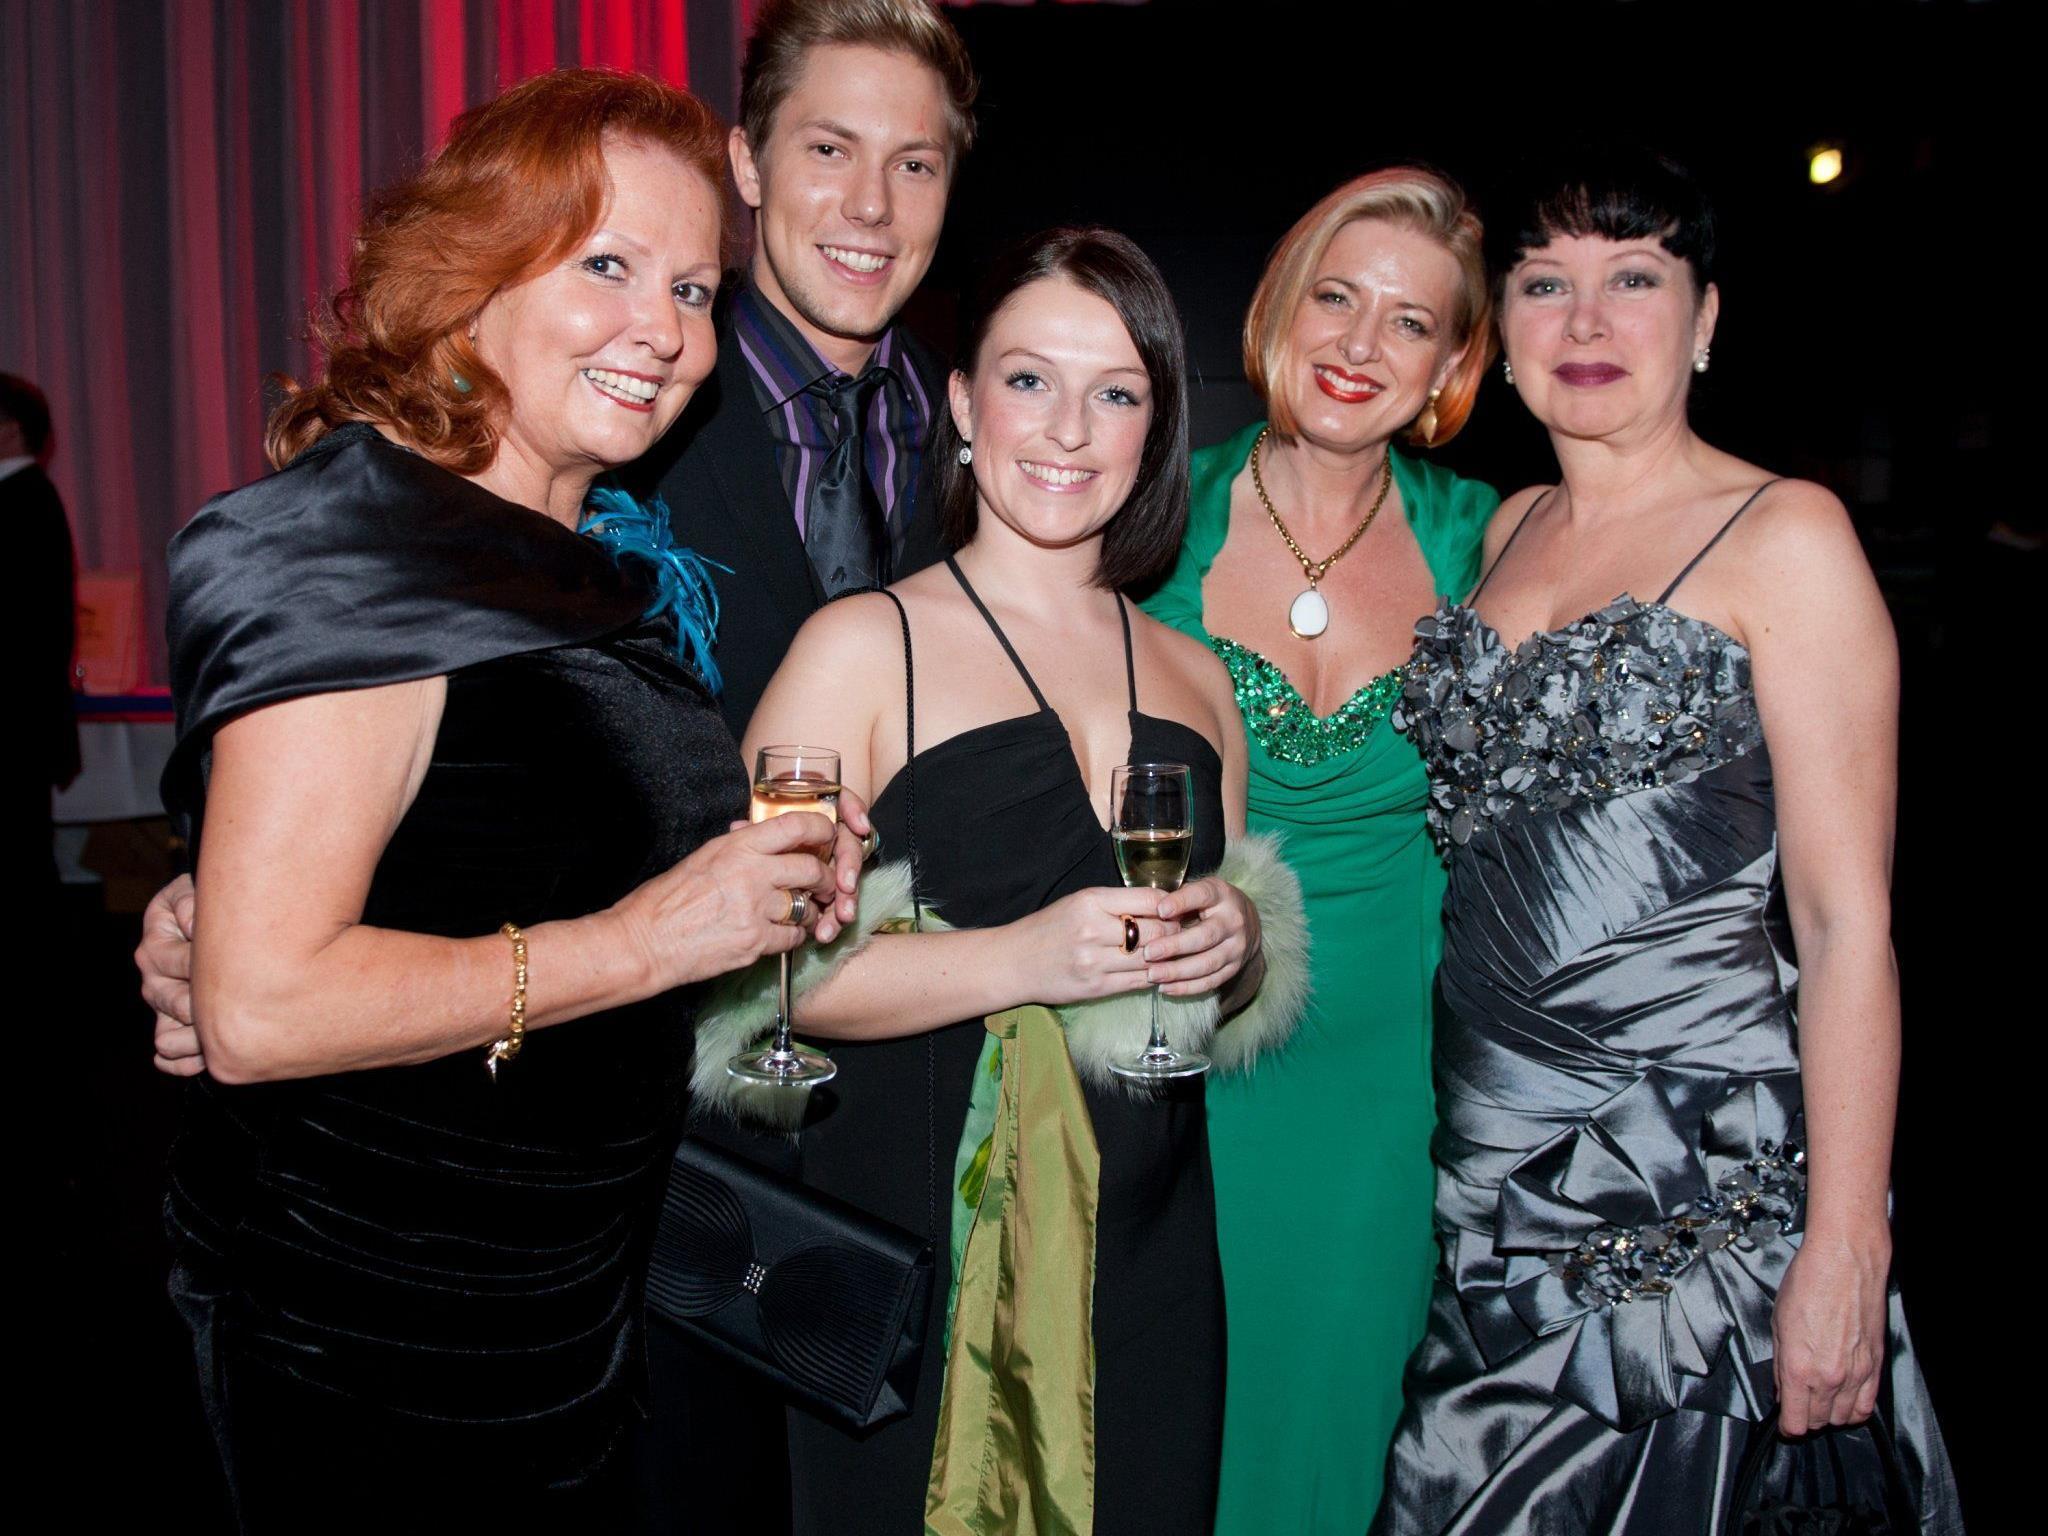 Ex-Prinzessin Beatrice Brugger mit dem zukünftigen Prinzen Maximilian Brugger, Stefanie Hofer, Anita Dressel-Malang und Ilona Oldenburg (v.l.).